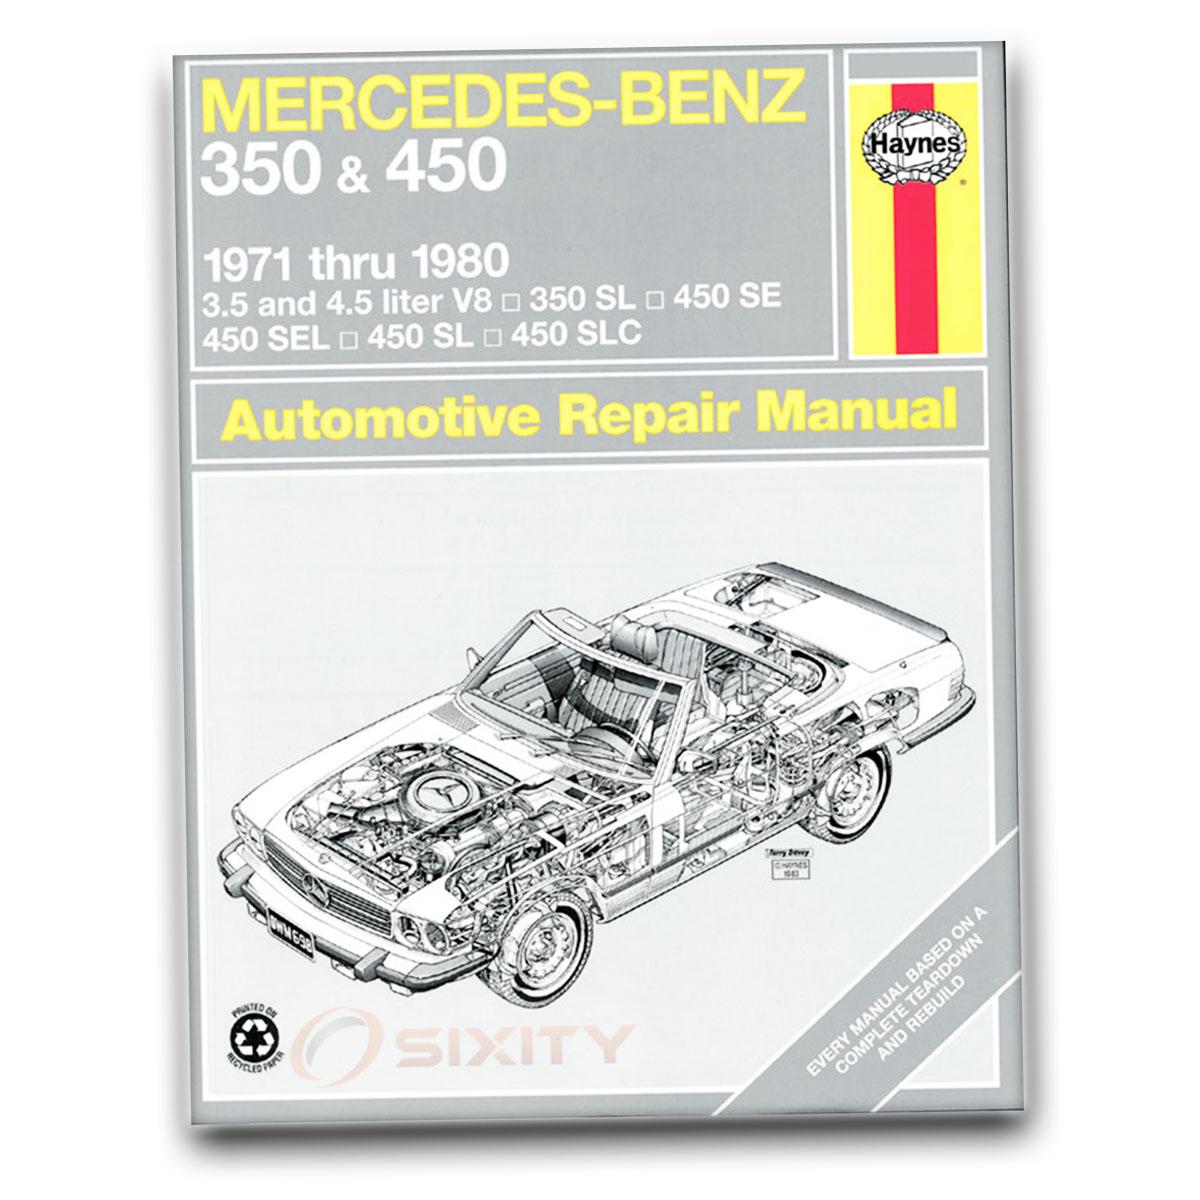 Haynes Repair Manual for Mercedes 450SLC Base Shop Service Garage Book qj